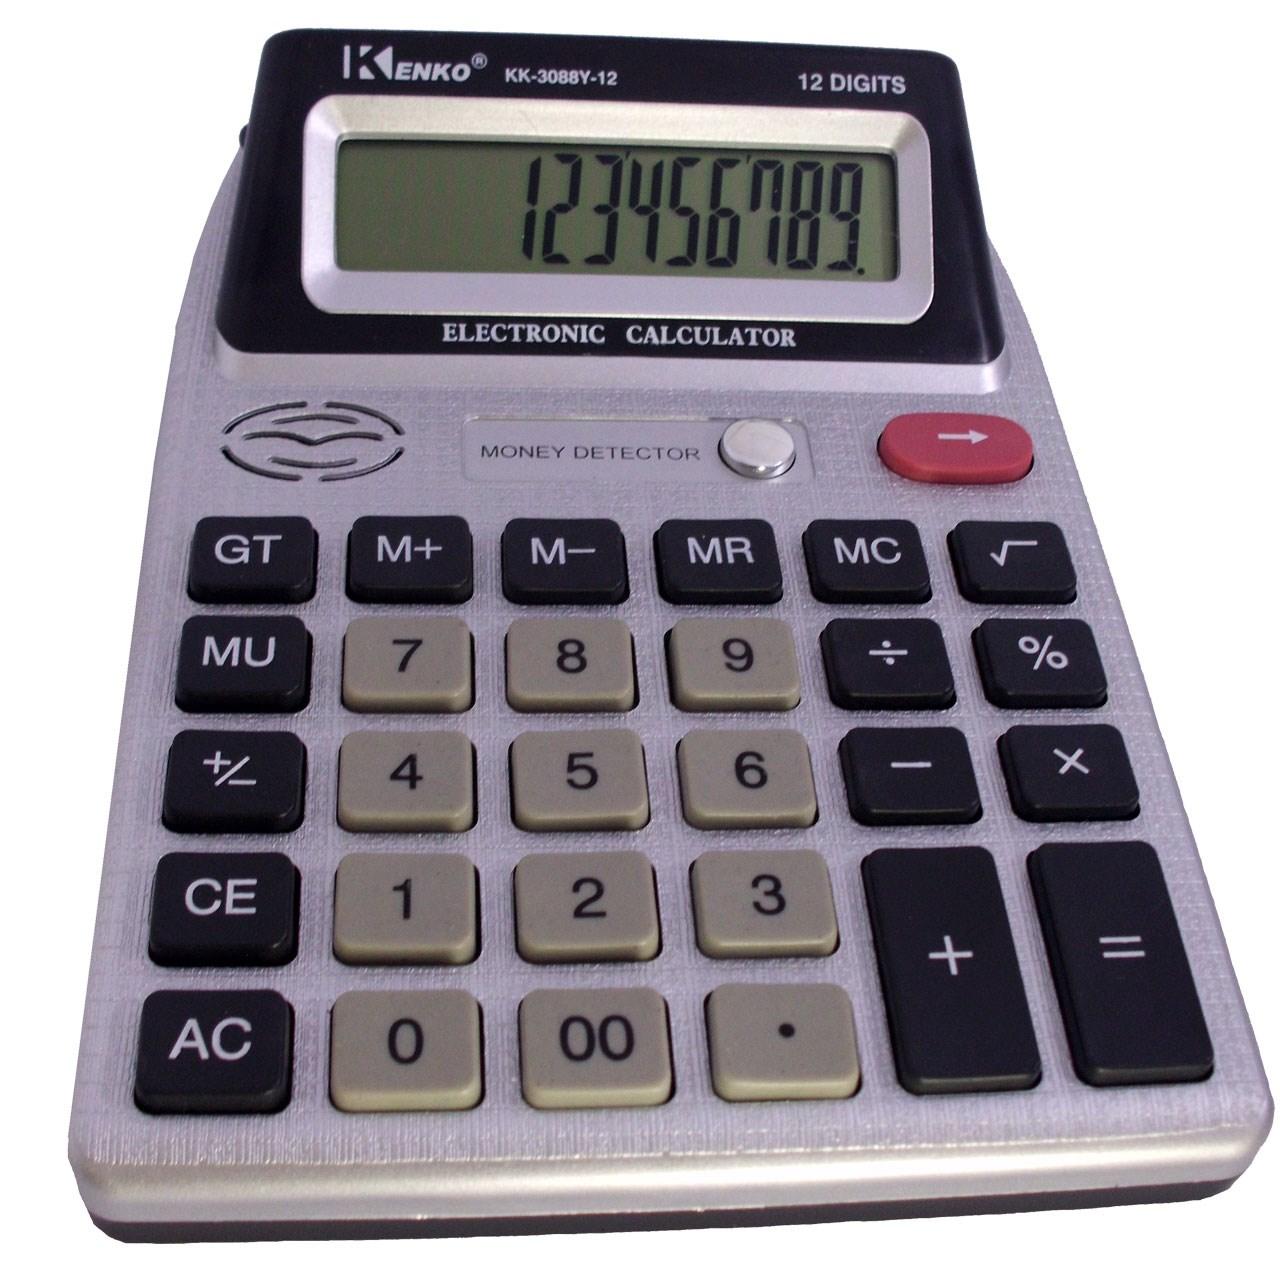 قیمت                      ماشین حساب کنکو مدل KK-3088Y-12